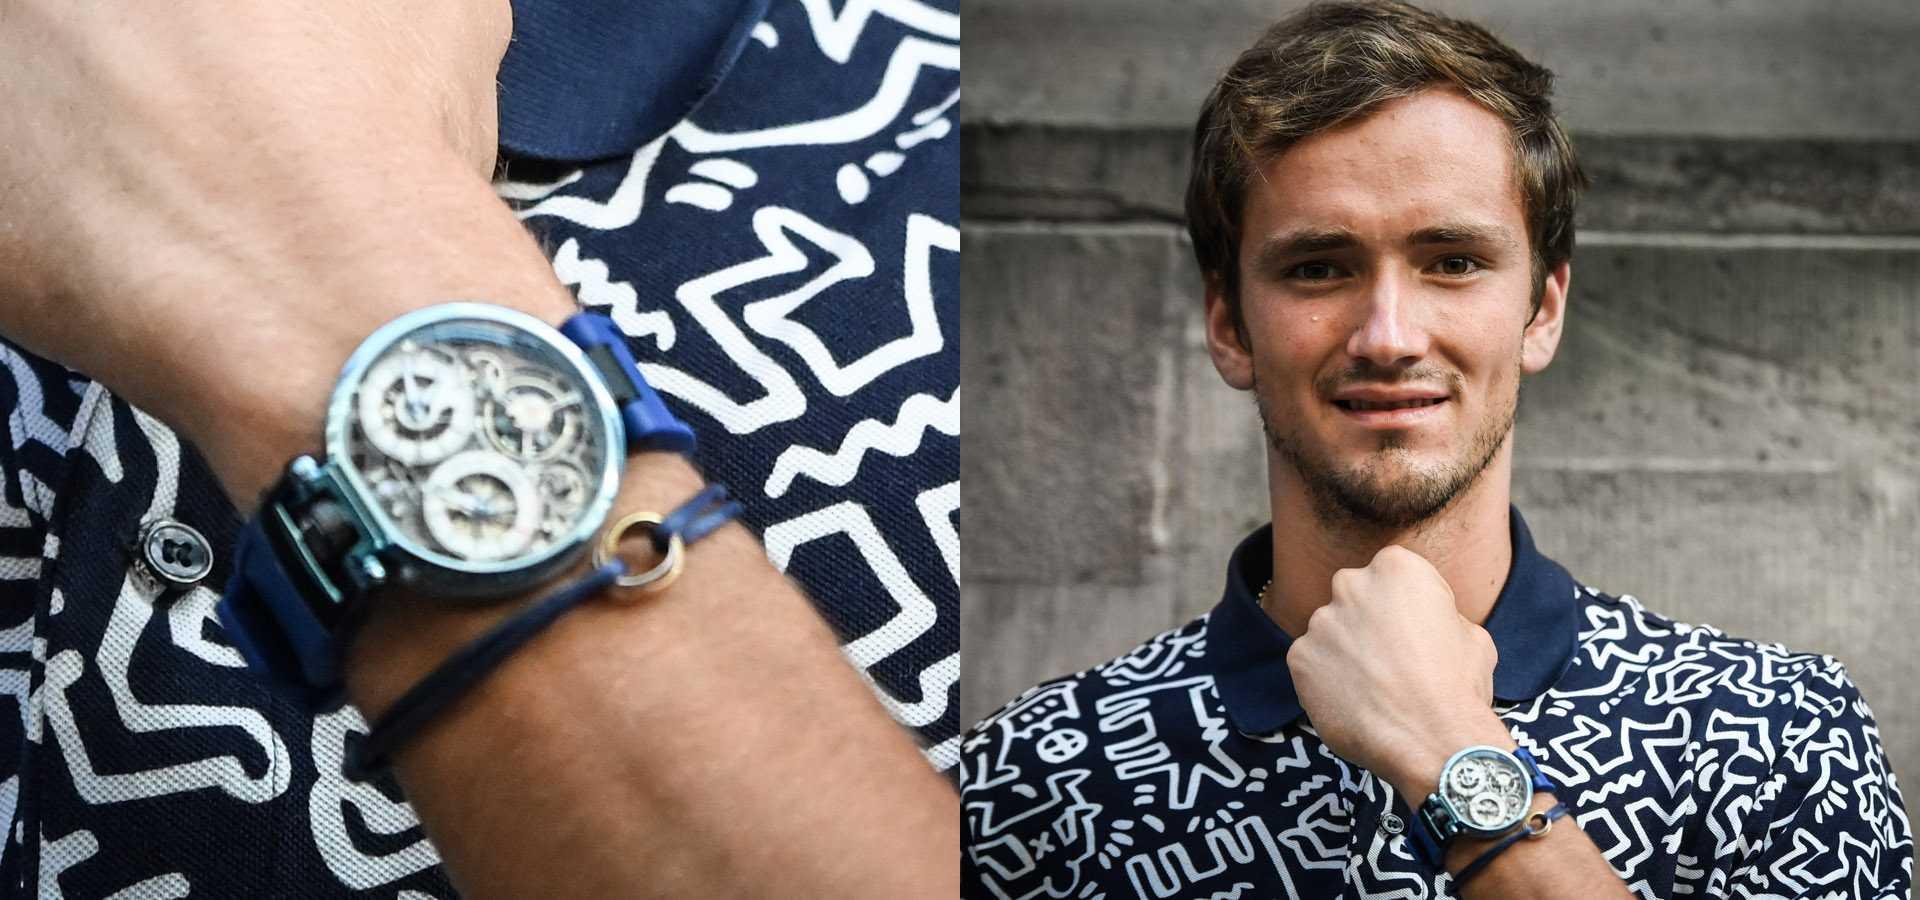 BOVET播威錶與網球明星Daniil Medvedev丹尼爾.梅德韋傑夫建立合作關係,Ottantasei陀飛輪腕錶光彩亮相